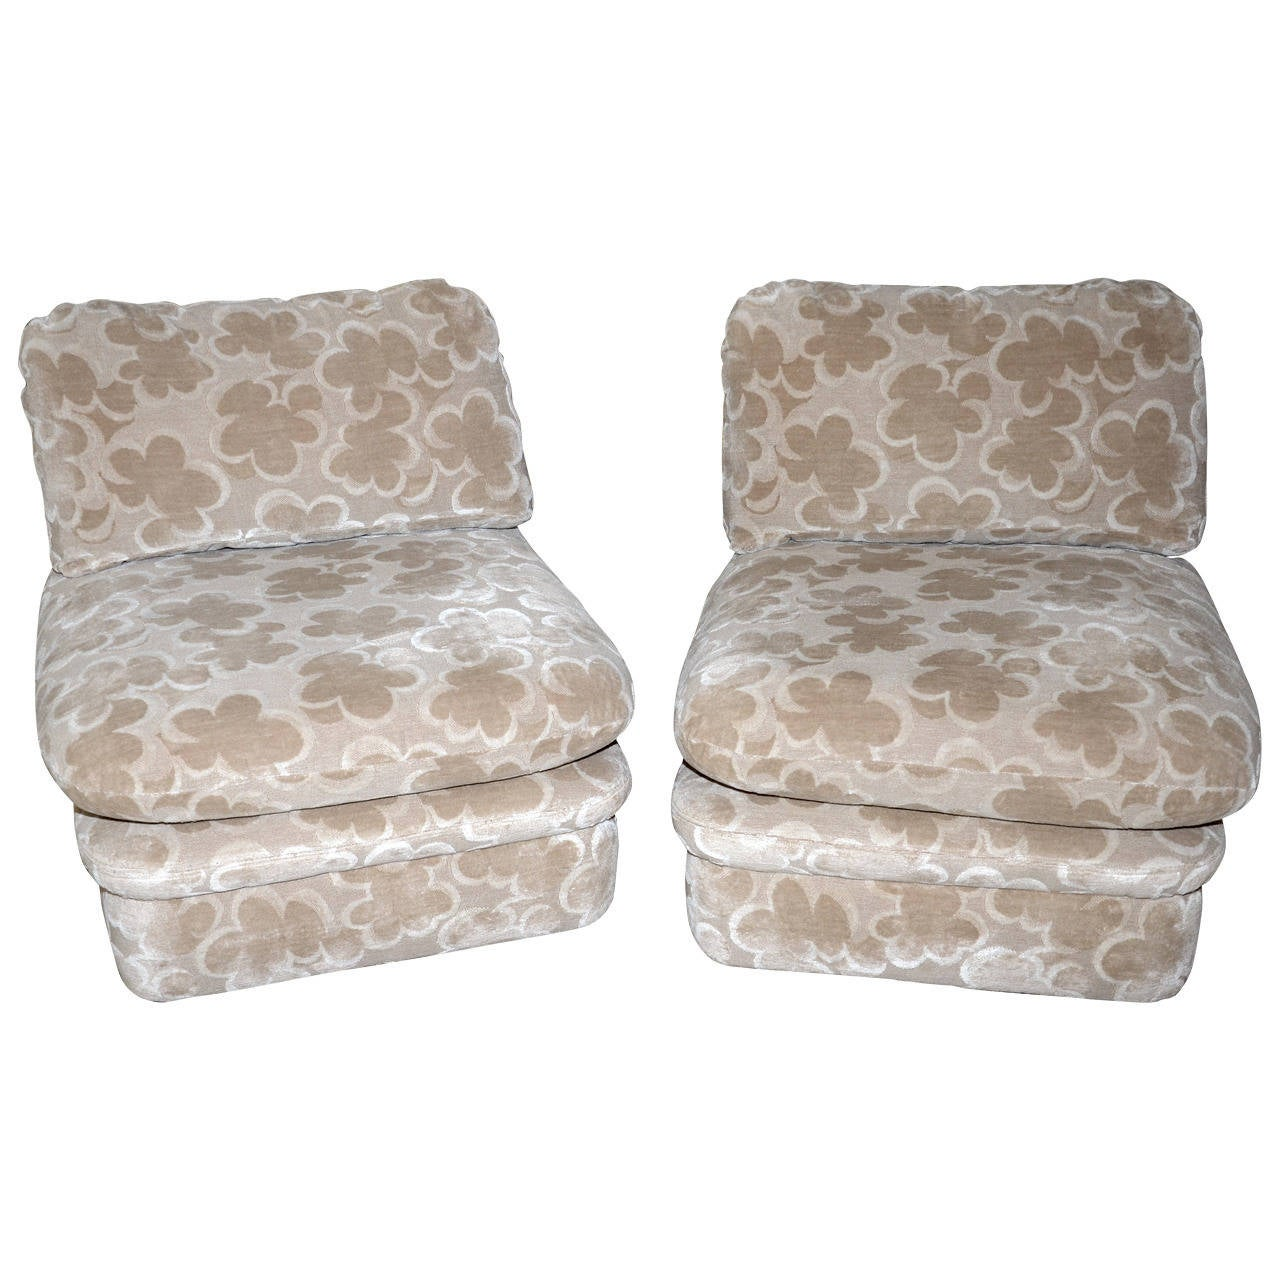 Pair of J. Robert Scott Clouds Slipper Chairs